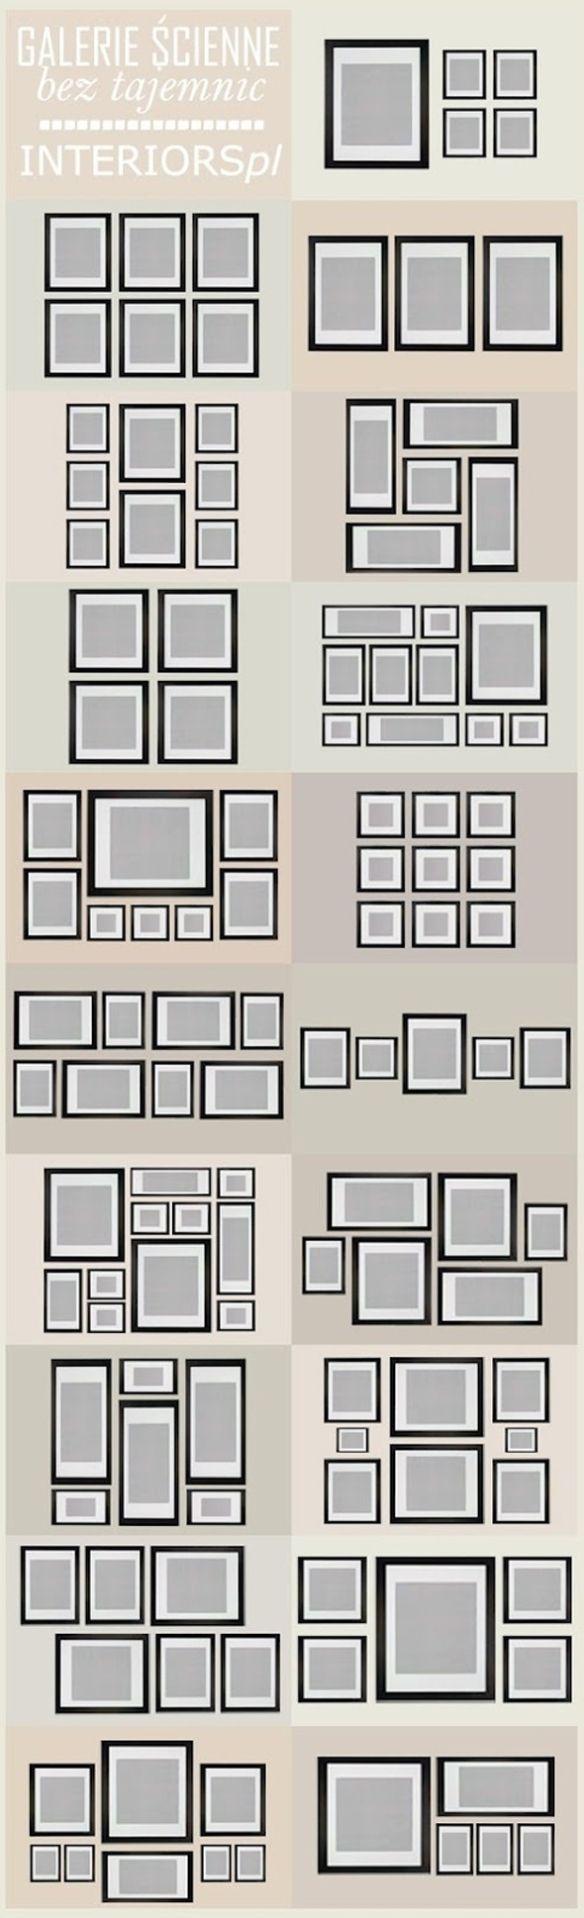 Frame arrangement ideas | Our home together | Pinterest | DIY ideas ...